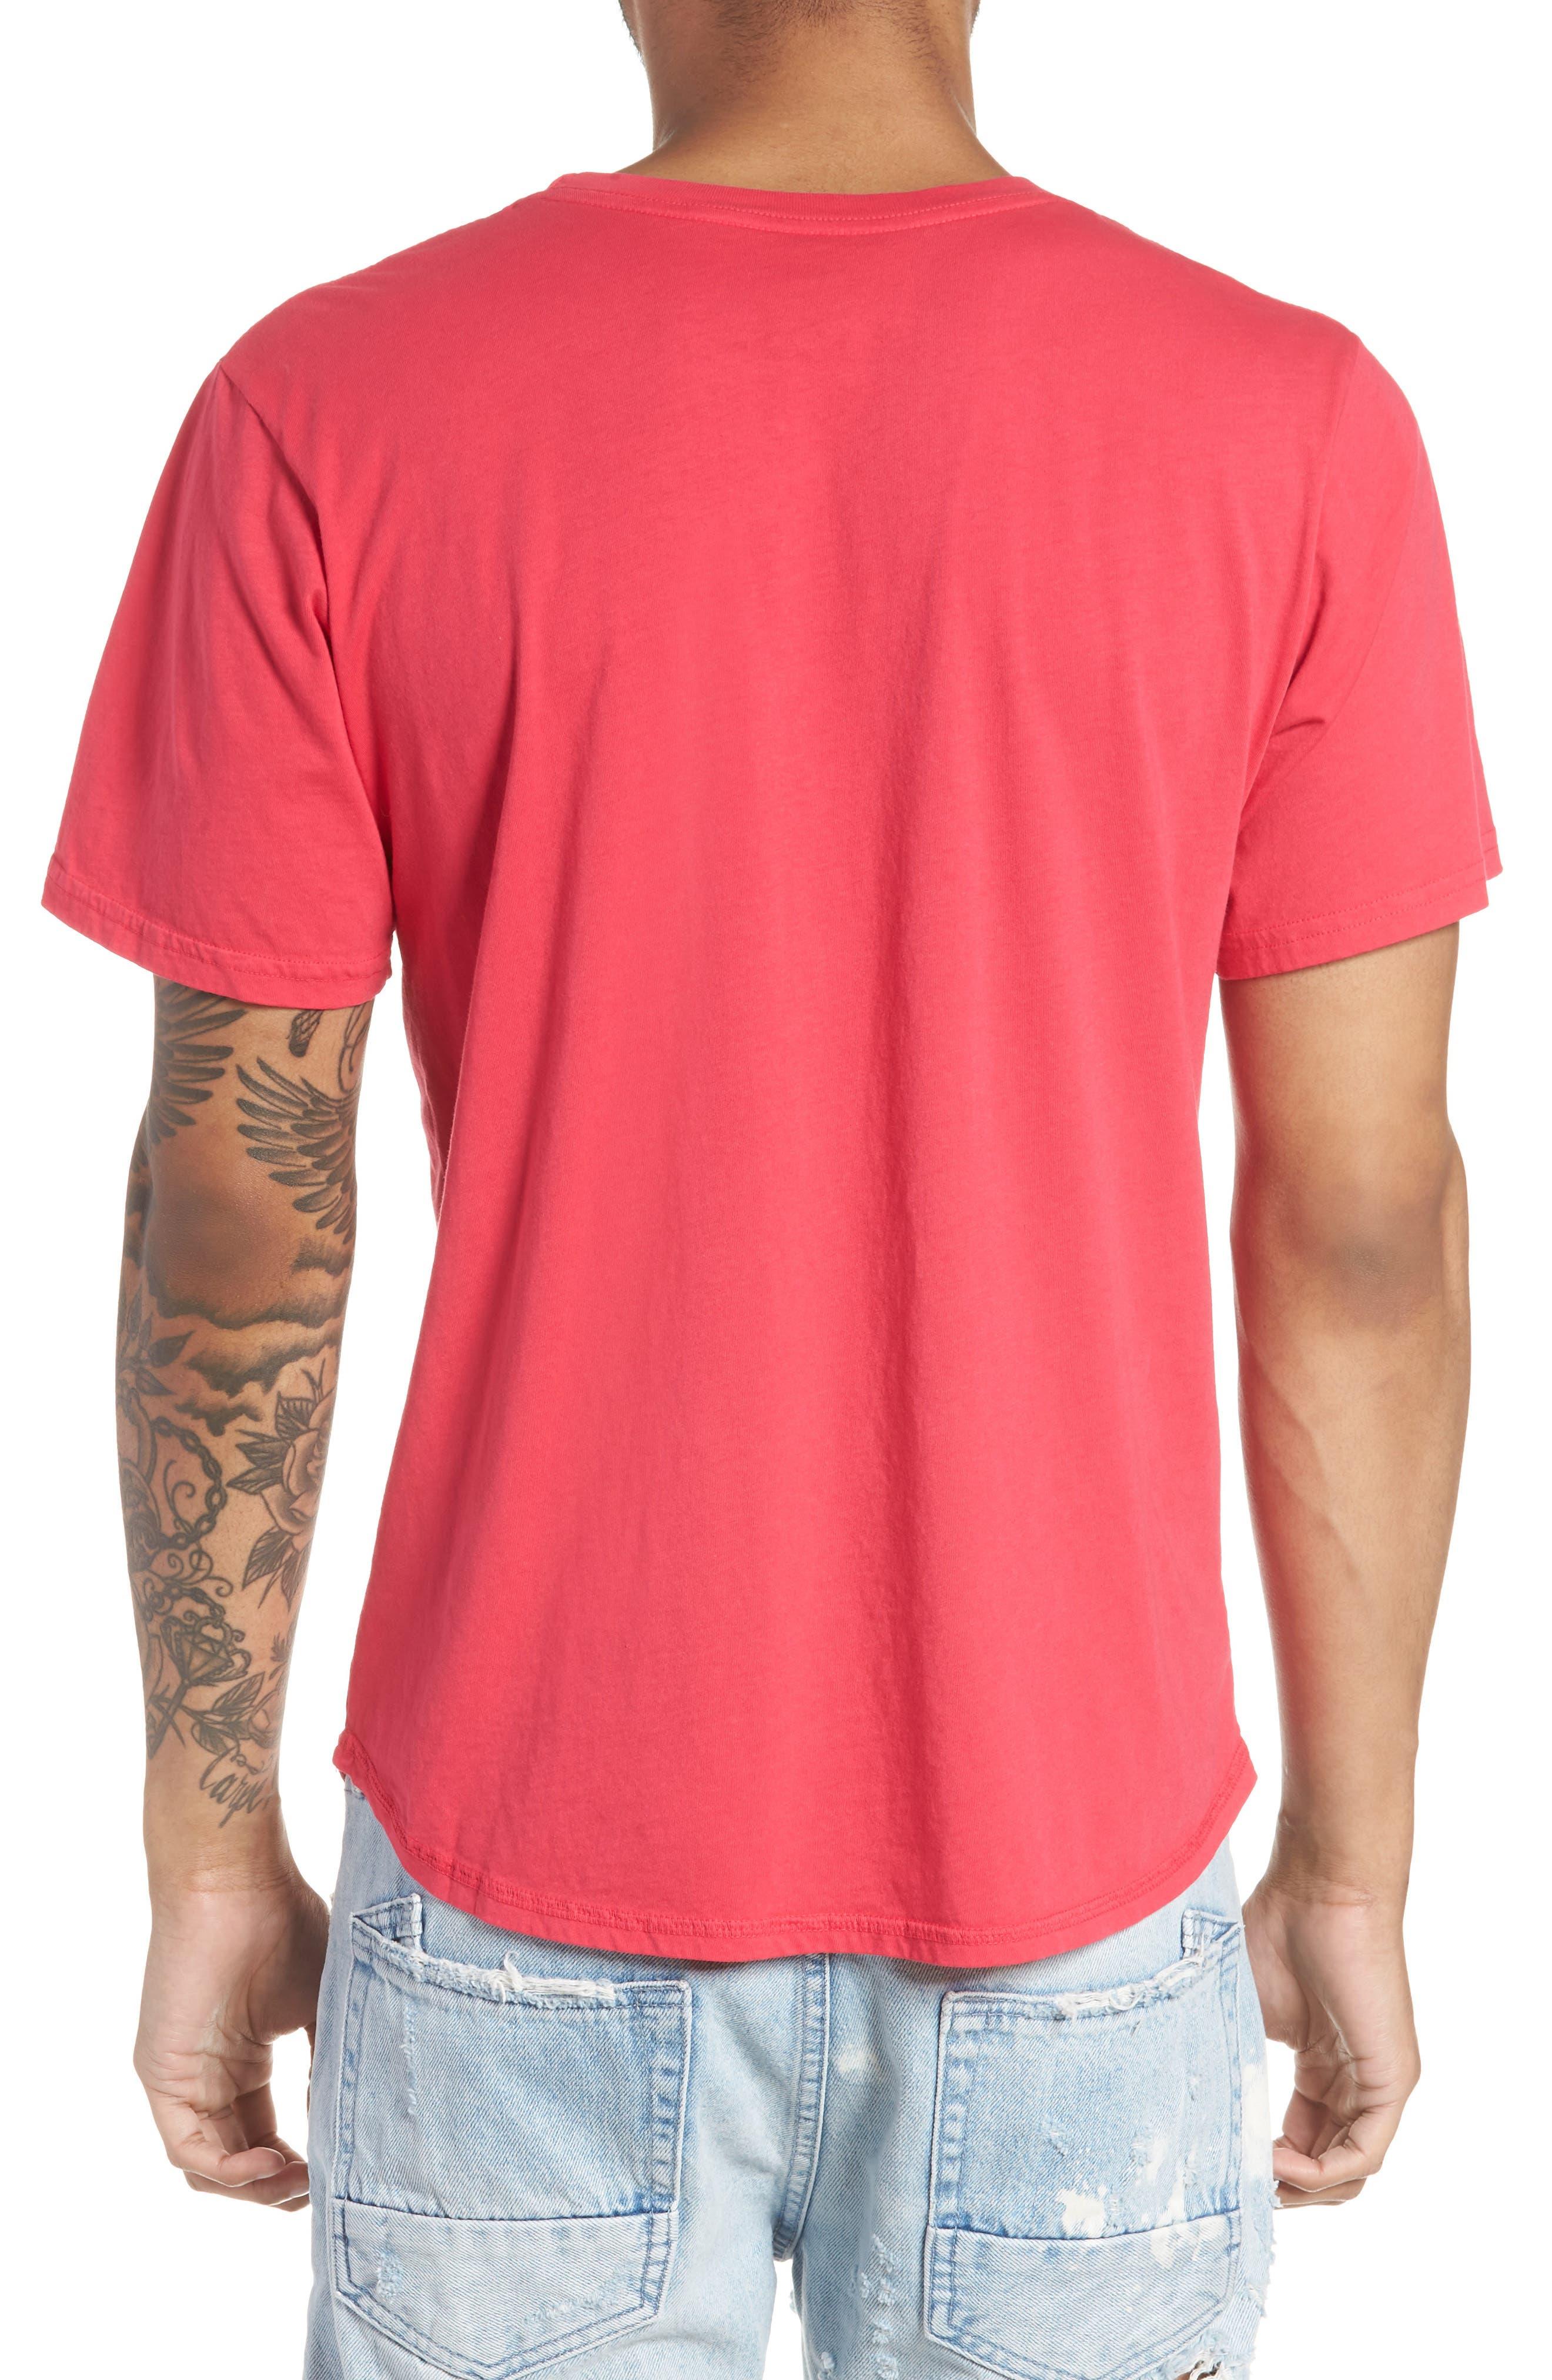 Generation Appropriation Crewneck T-Shirt,                             Alternate thumbnail 2, color,                             Punk Pink